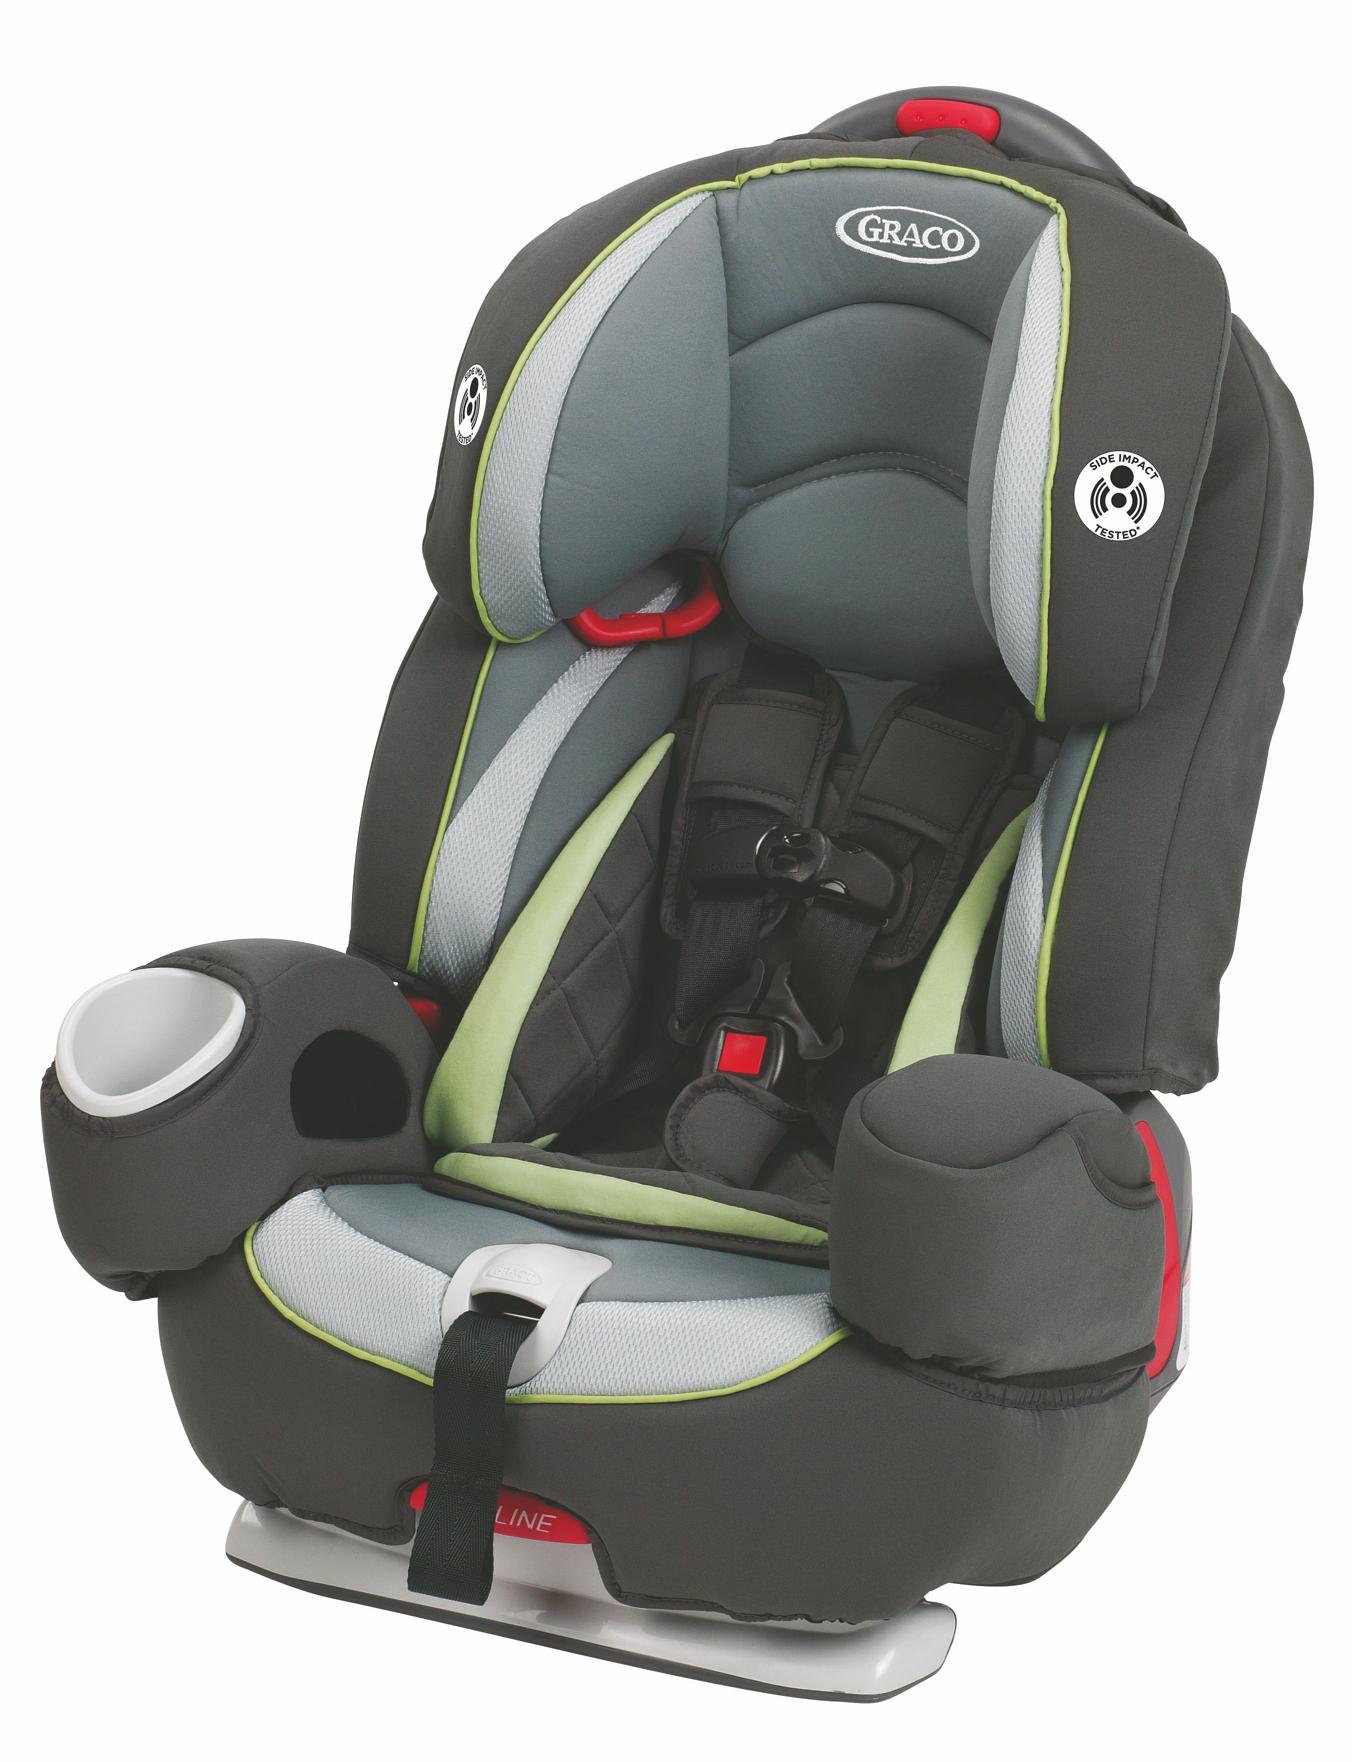 graco argos 80 elite 3 in 1 car seat azalea baby. Black Bedroom Furniture Sets. Home Design Ideas